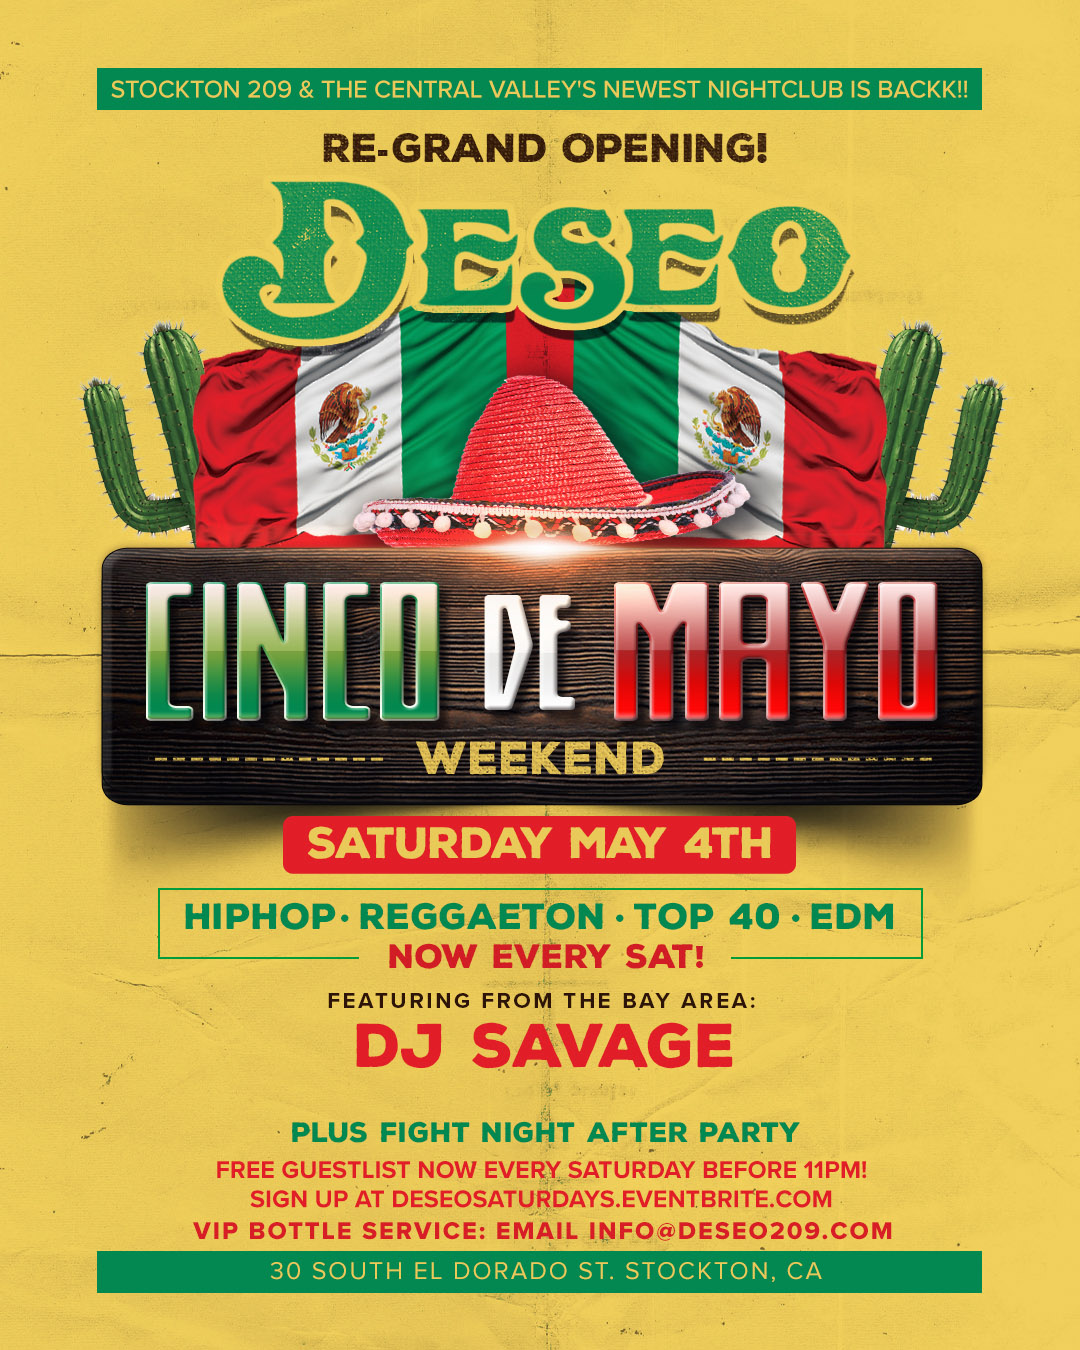 Deseo Re Grand Opening Sat May Hiphop Top Edm Reggaeton Jpg 1080x1350 Vip Bottle Server Job